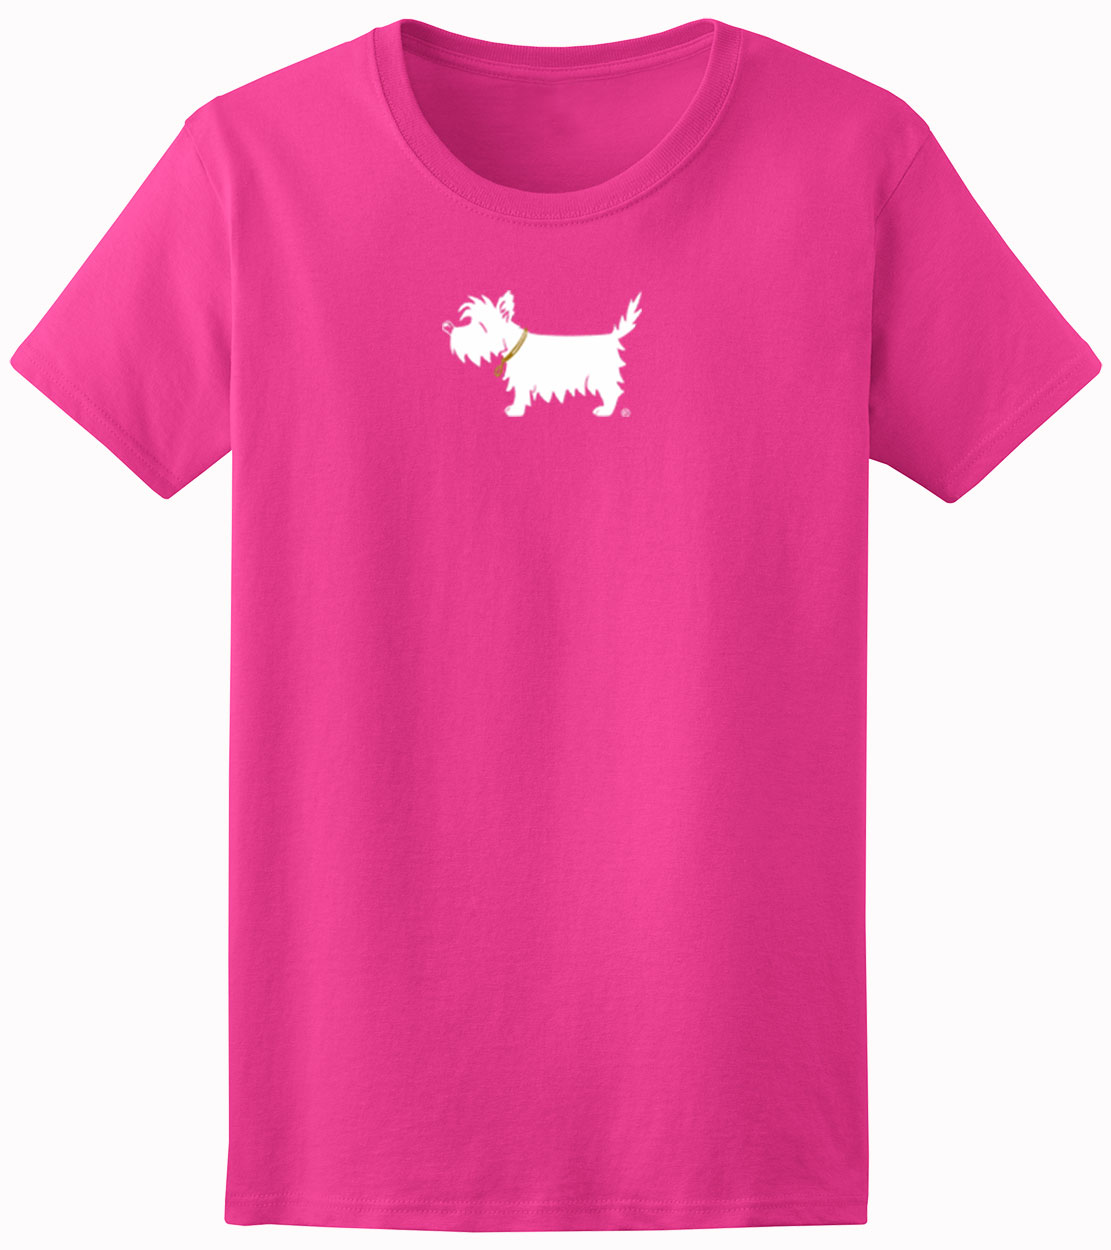 Ladies 39 westie t shirt white dog ladies 39 trendy t shirt for Trendy t shirts for ladies